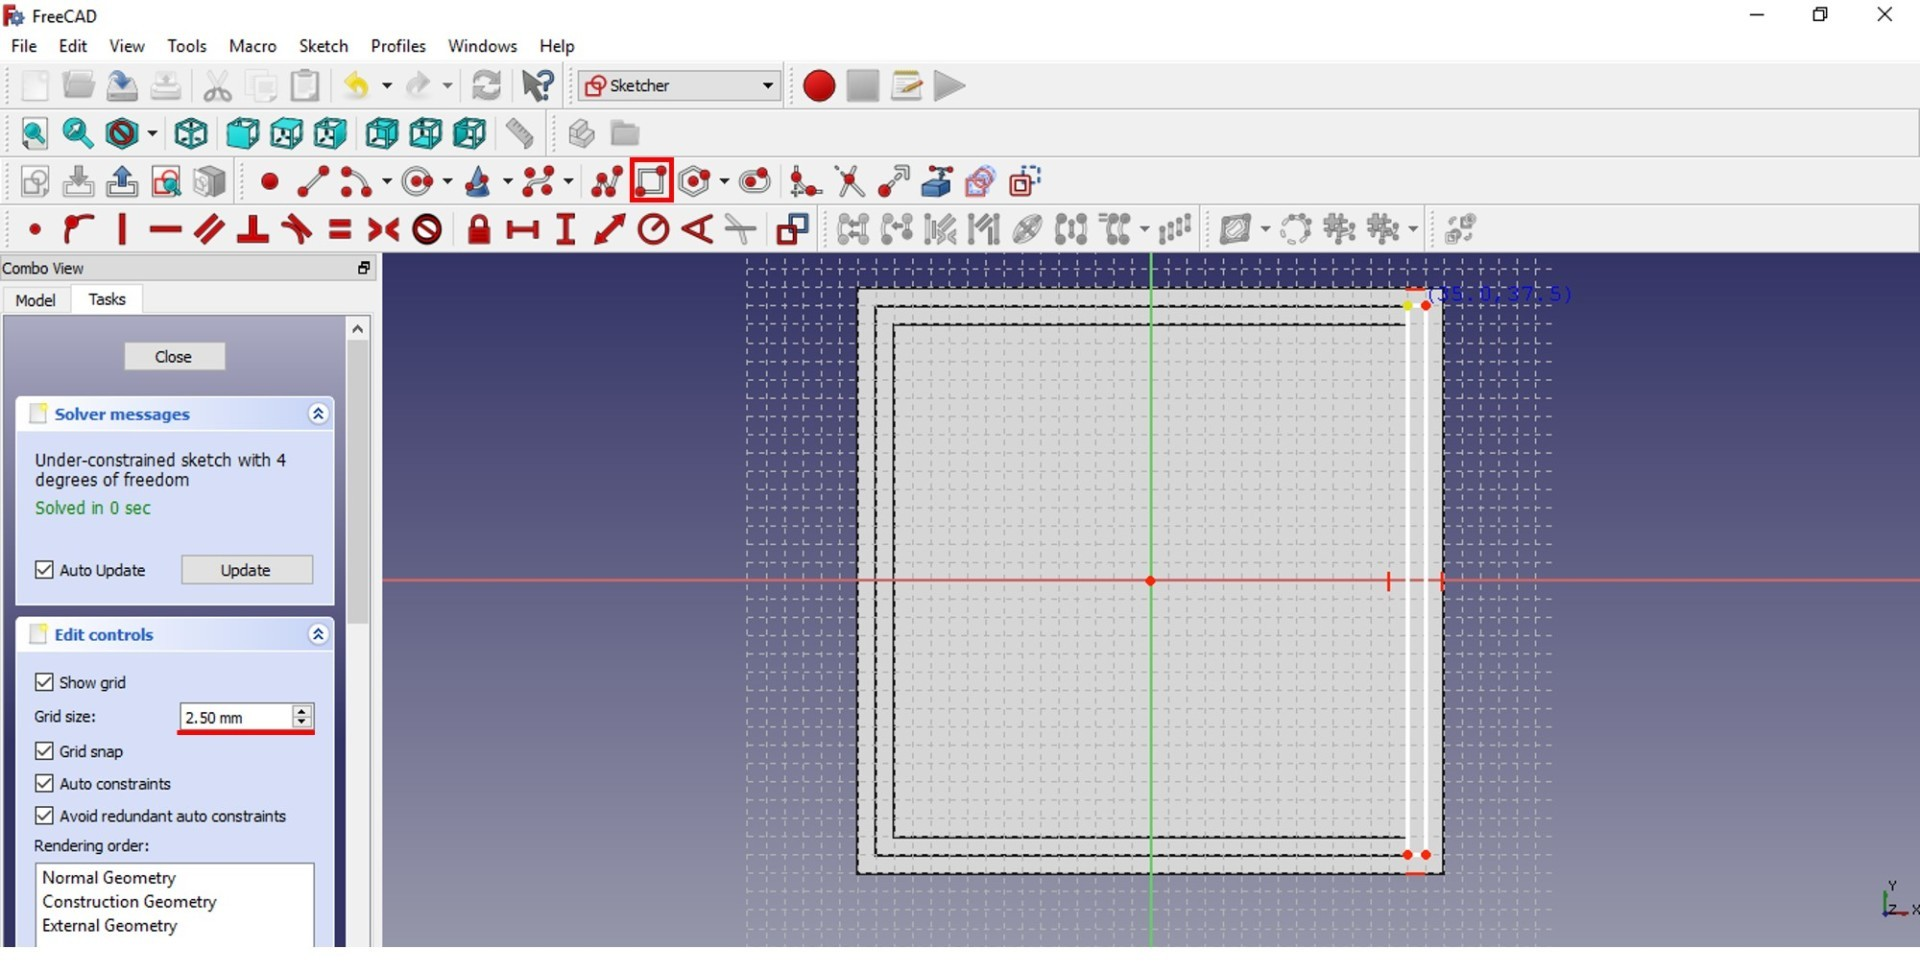 freecad tutorial upper view fillet 2.5